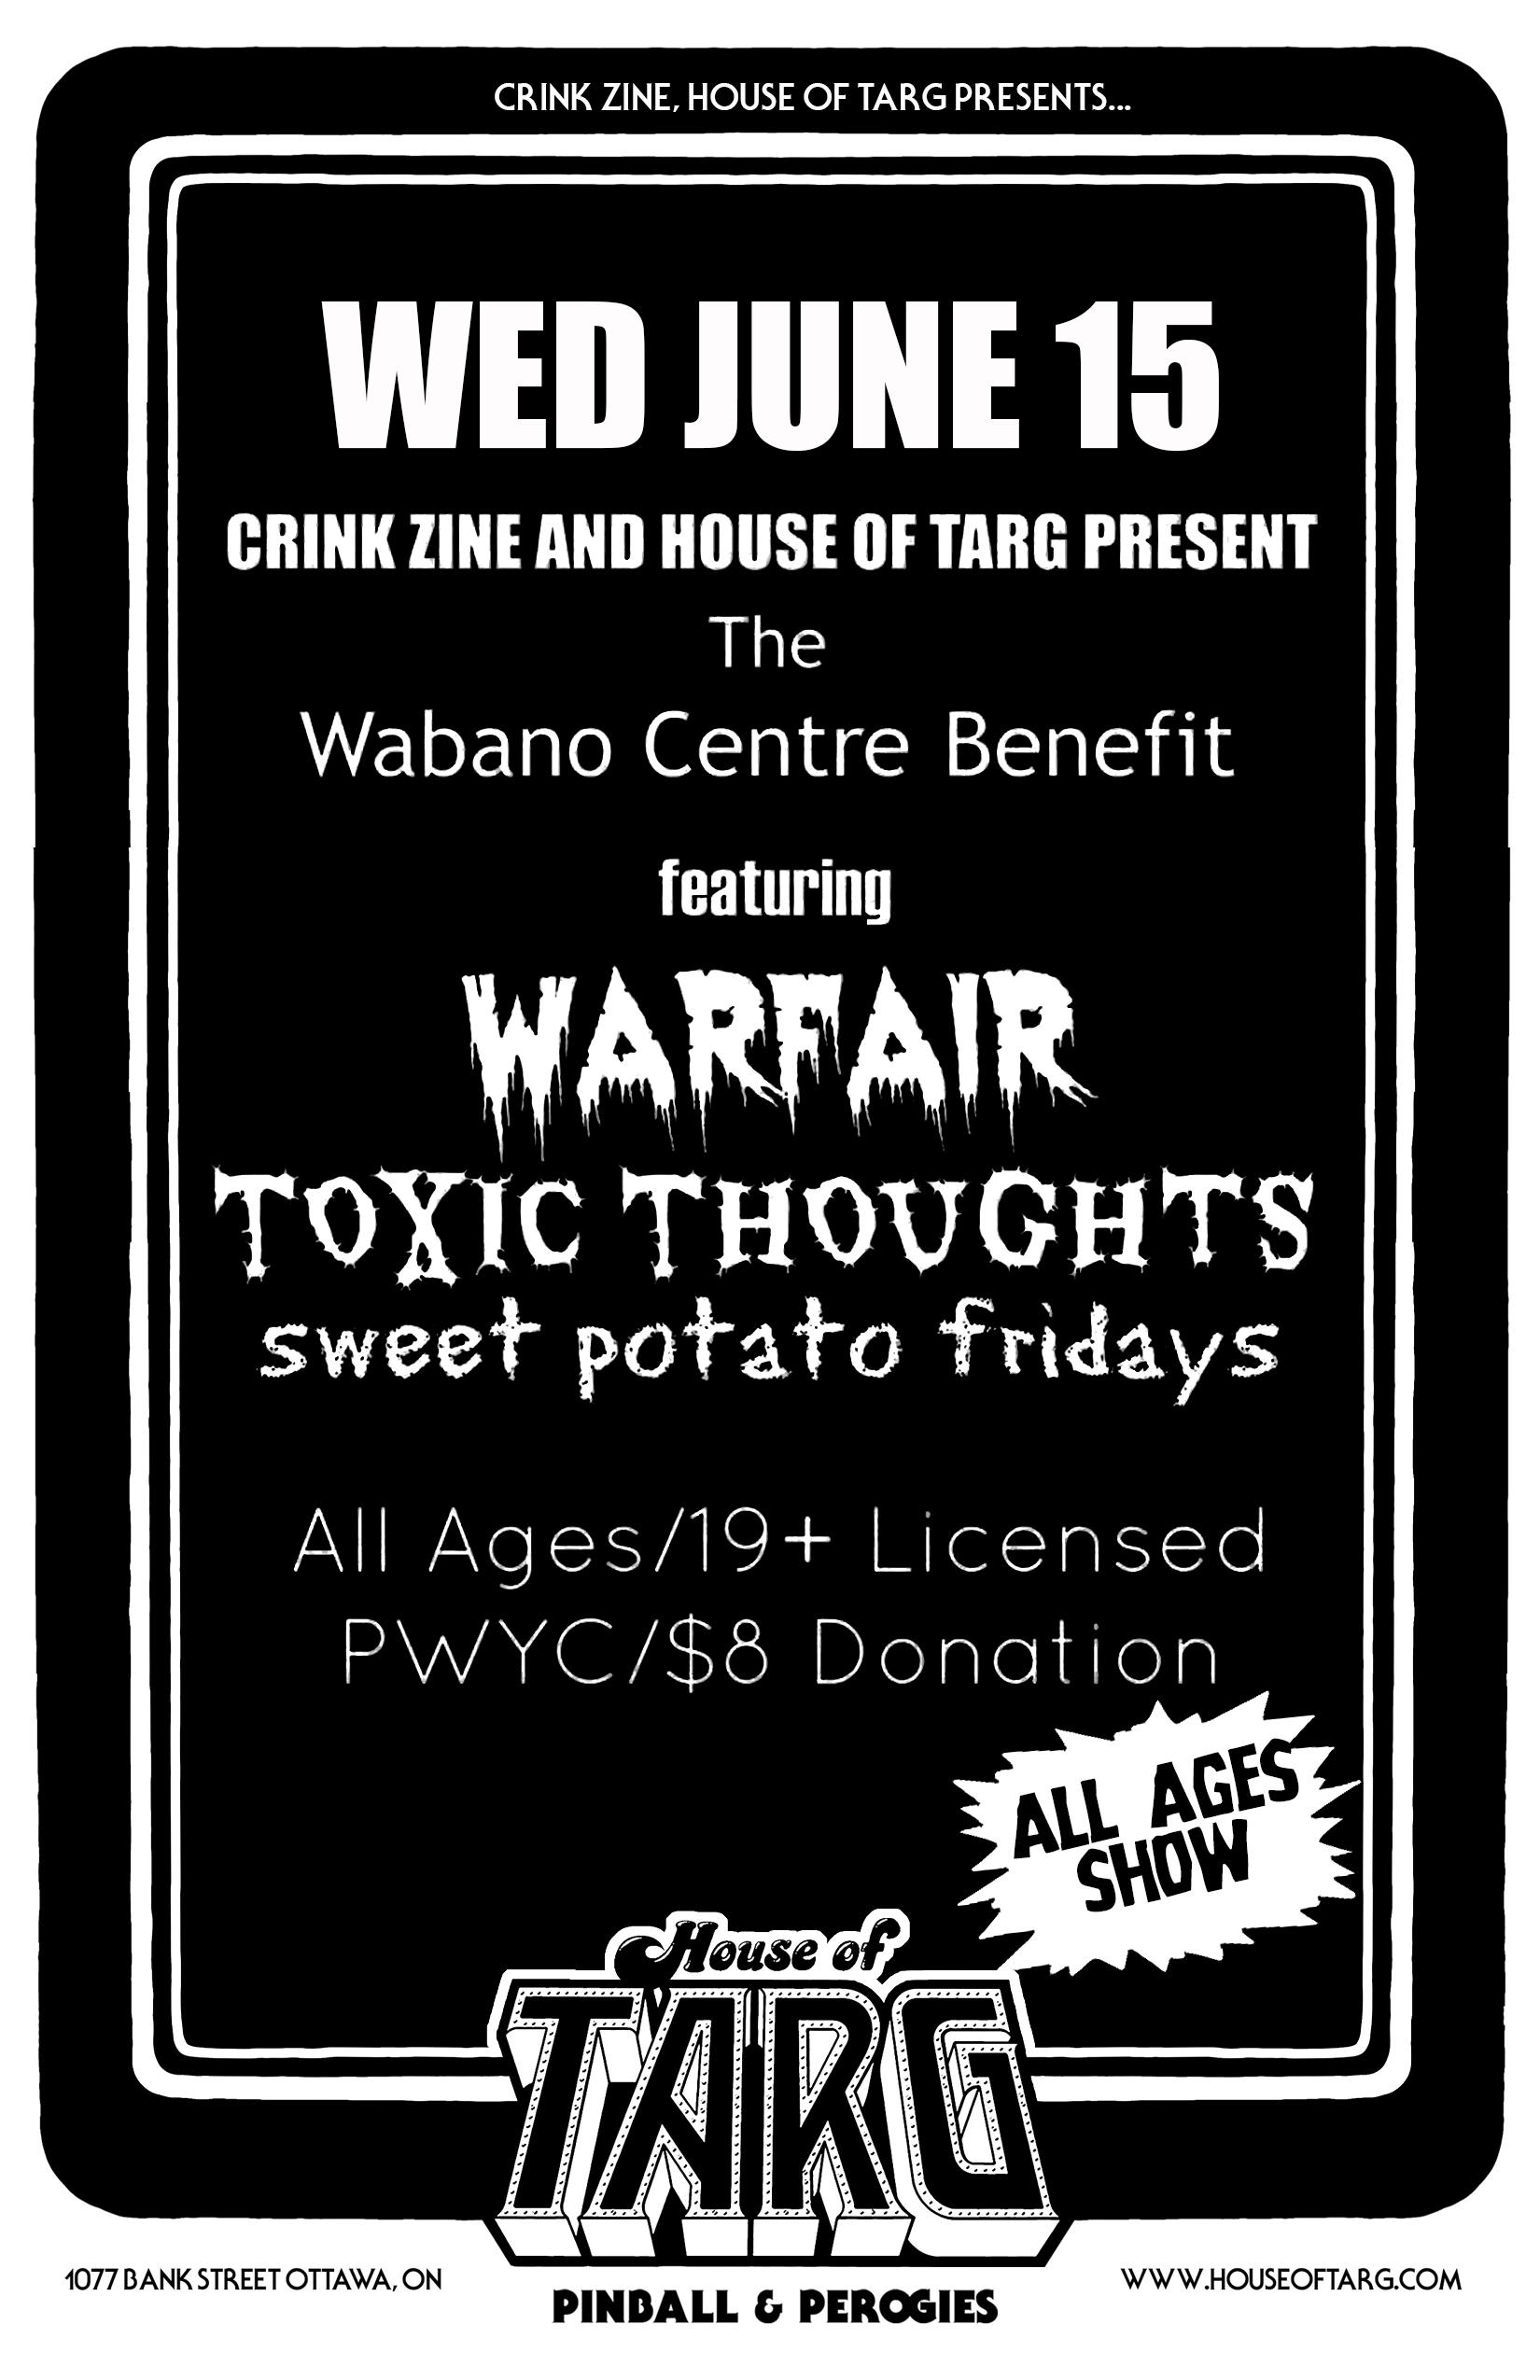 WARFAIR + Toxic Thoughts + Sweet Potato Fridays — House Of TARG